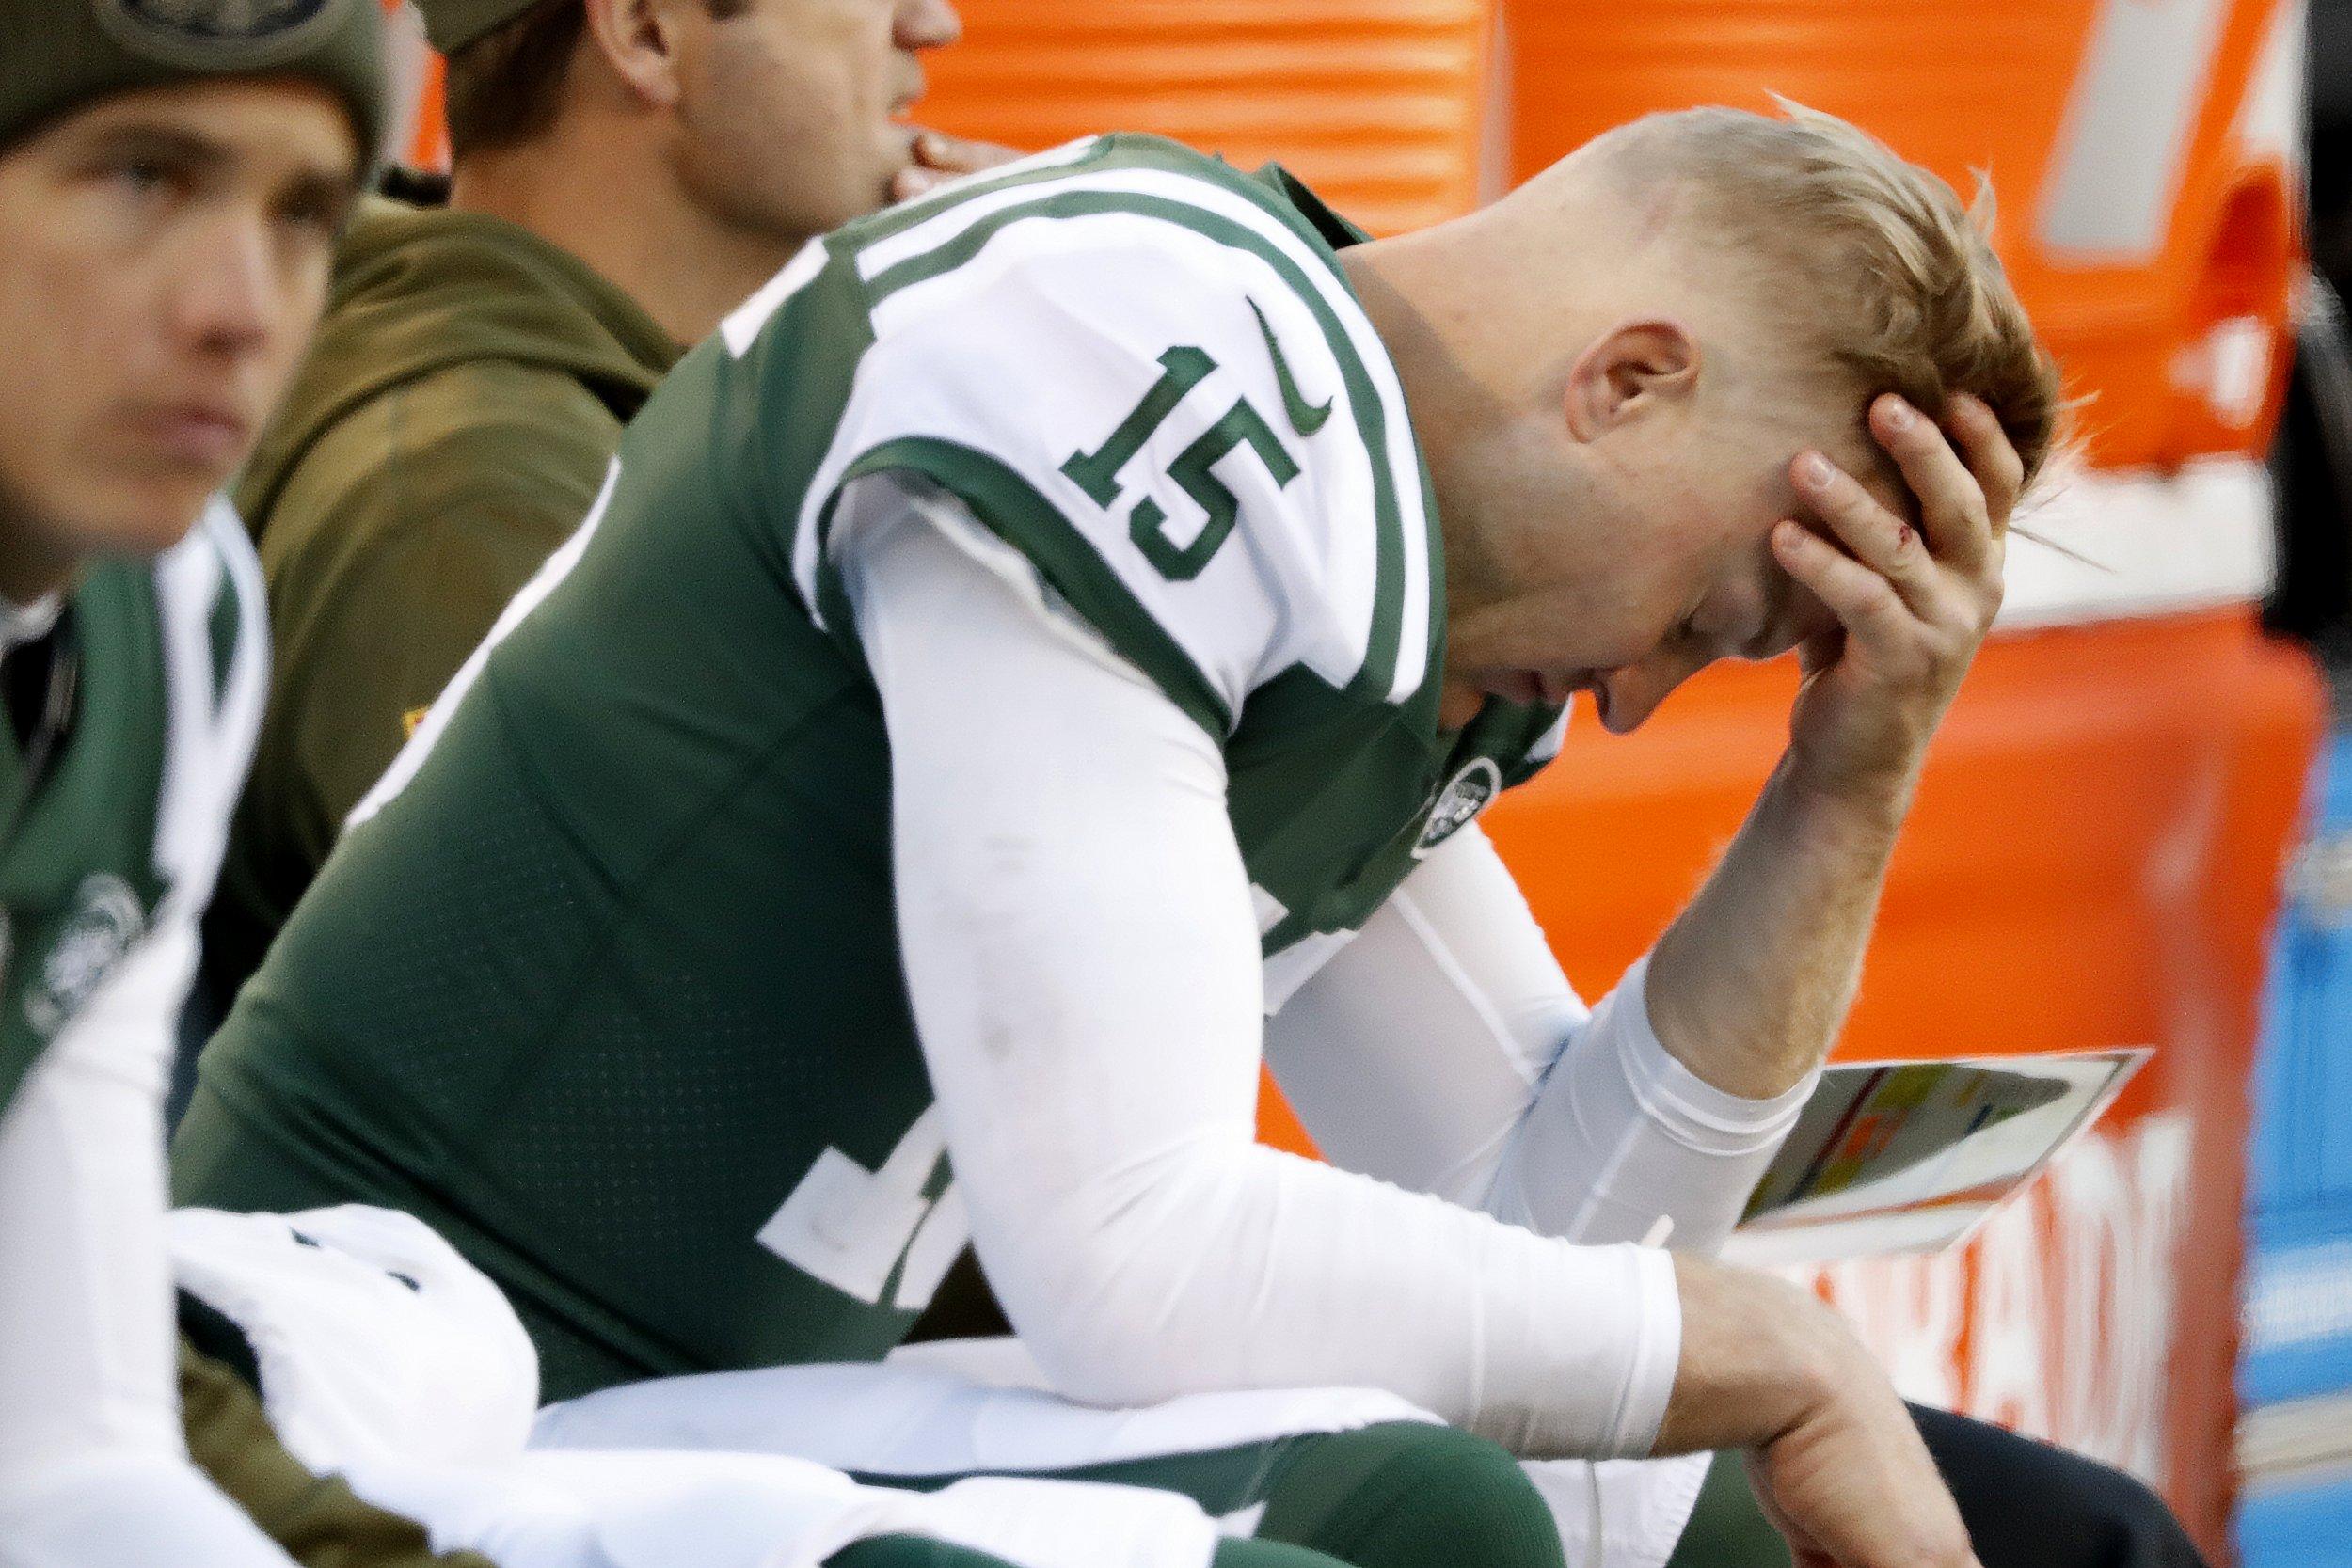 New York Jets Josh McCown